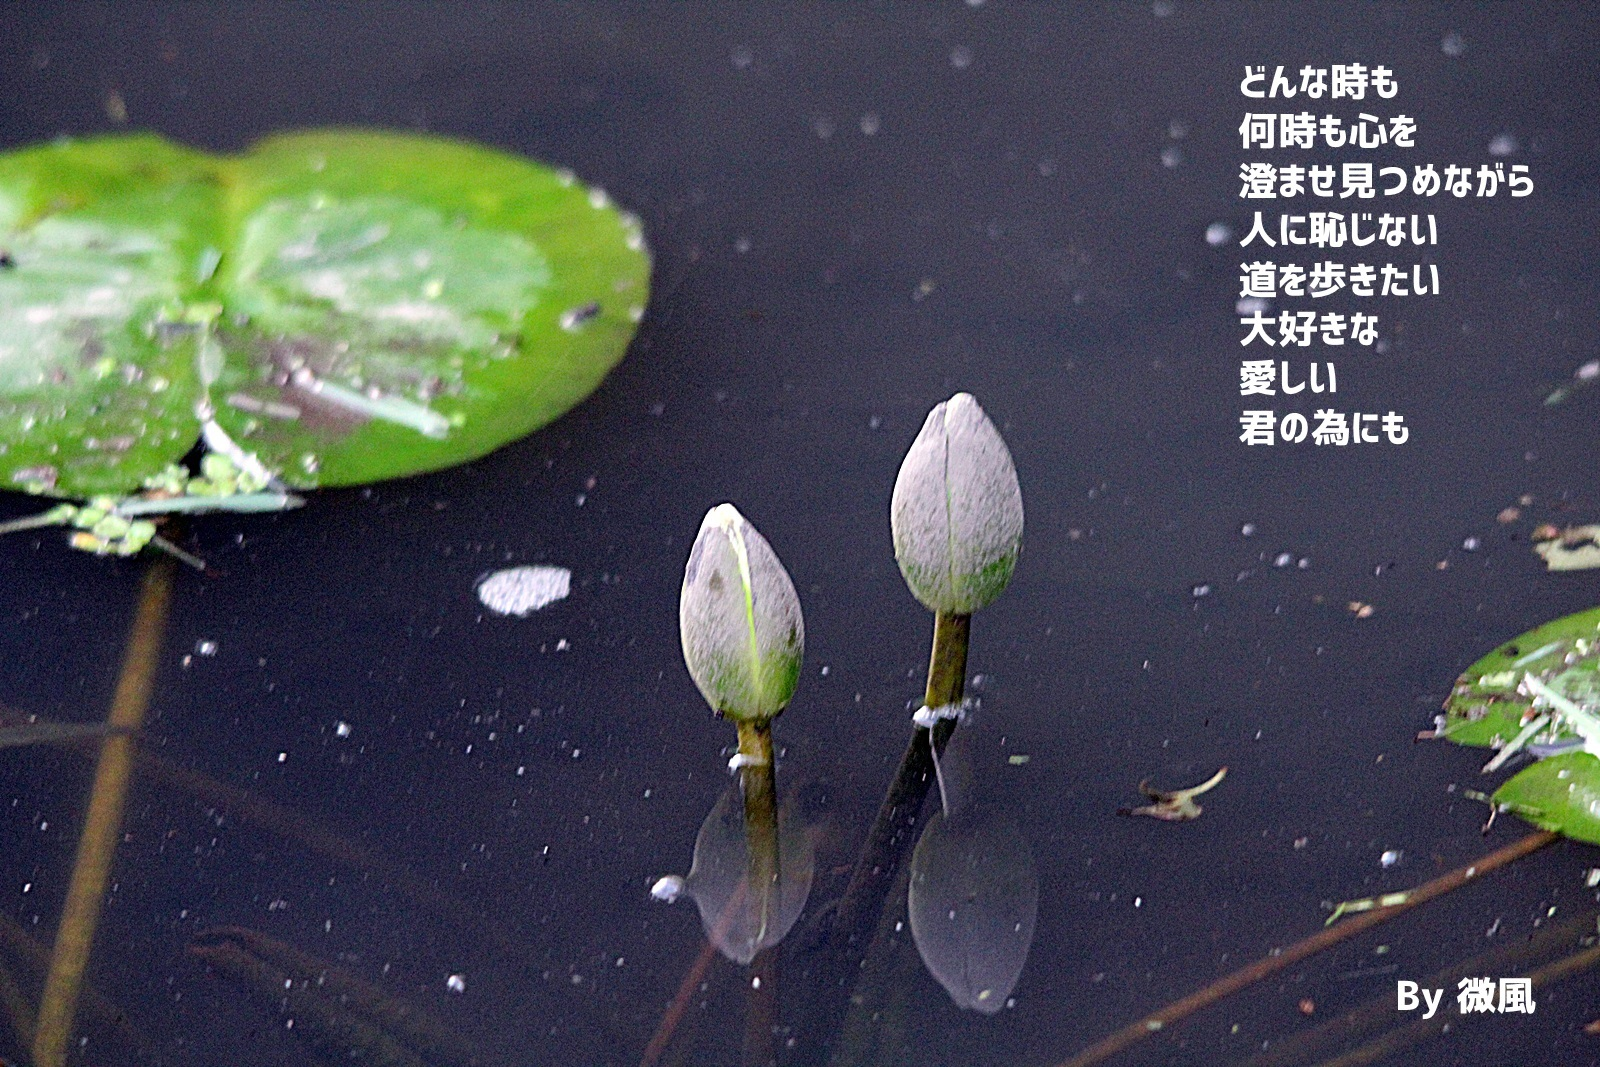 2017-07-01-a.jpg